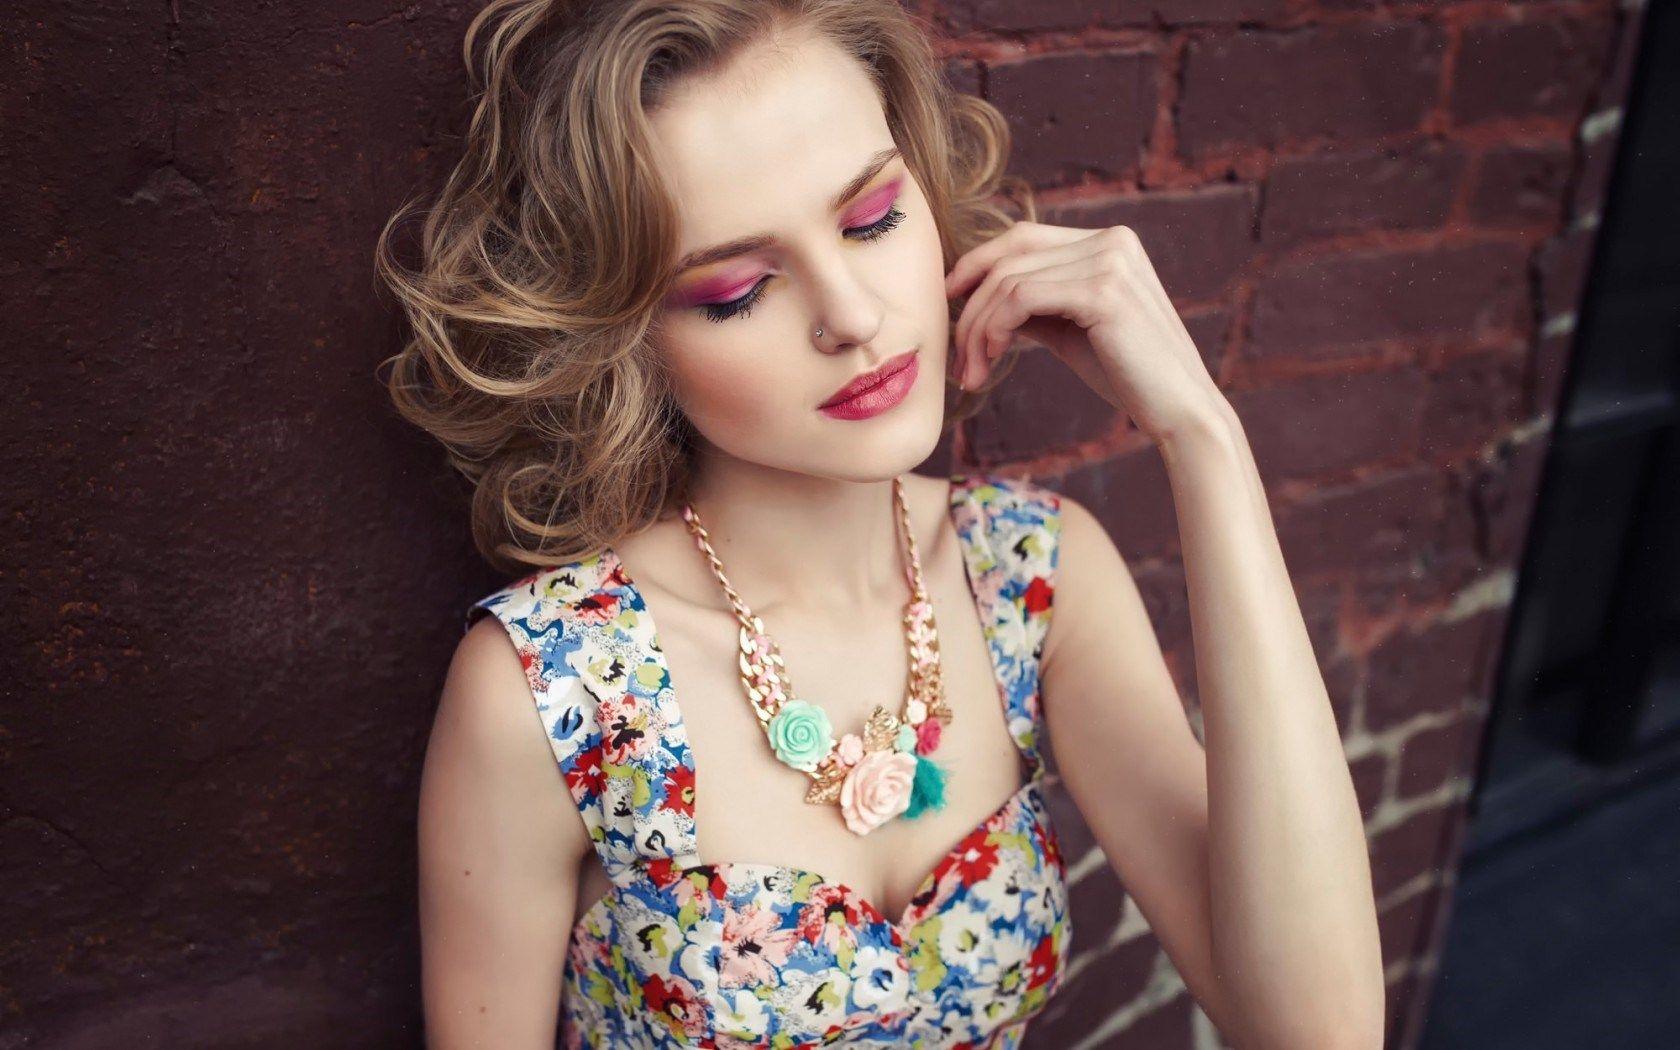 jewelry model | Photography-jewelry | Pinterest | Jewelry model ...